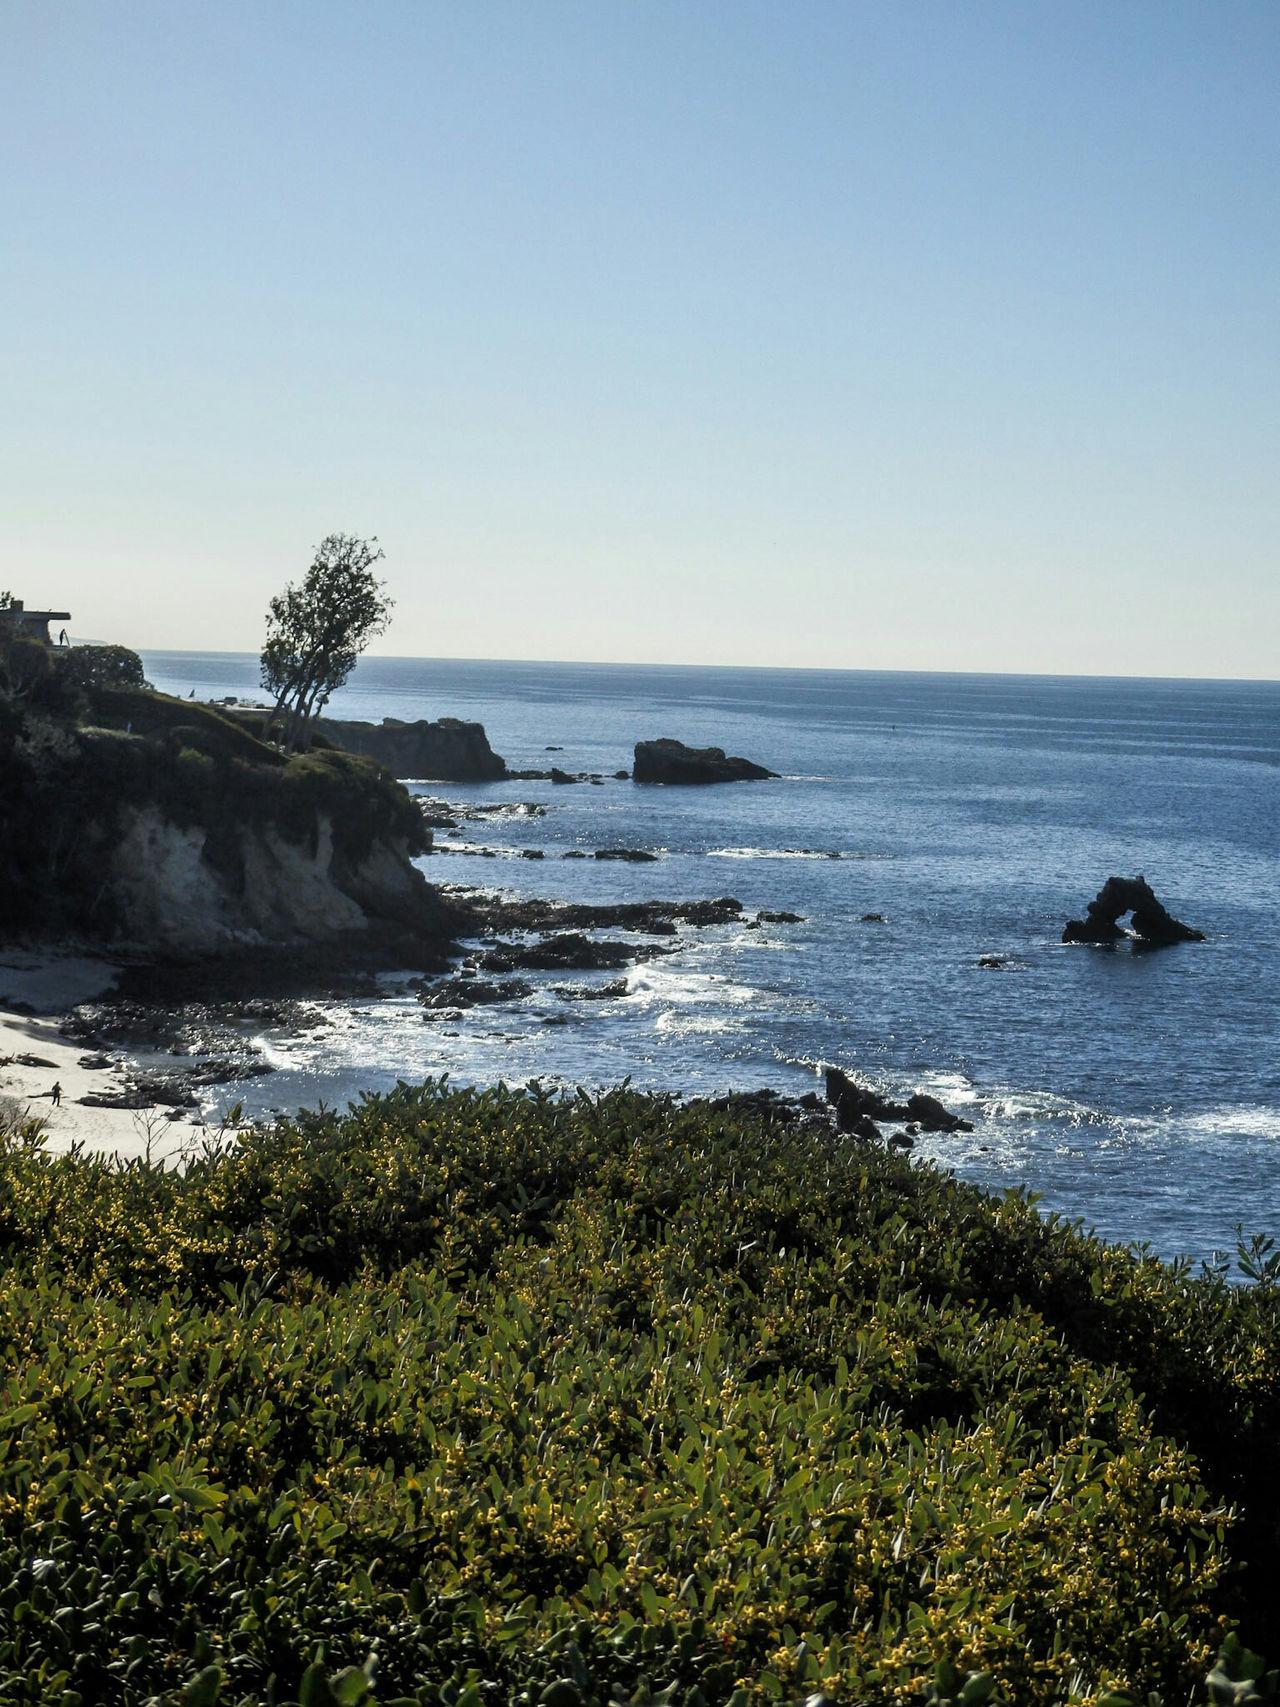 Rocks And Water Seashore Beach Coastline Coastal The Great Outdoors With Adobe California Beaches Coastal Views Coastal Beauty Coastline Landscape The Great Outdoors - 2016 EyeEm Awards